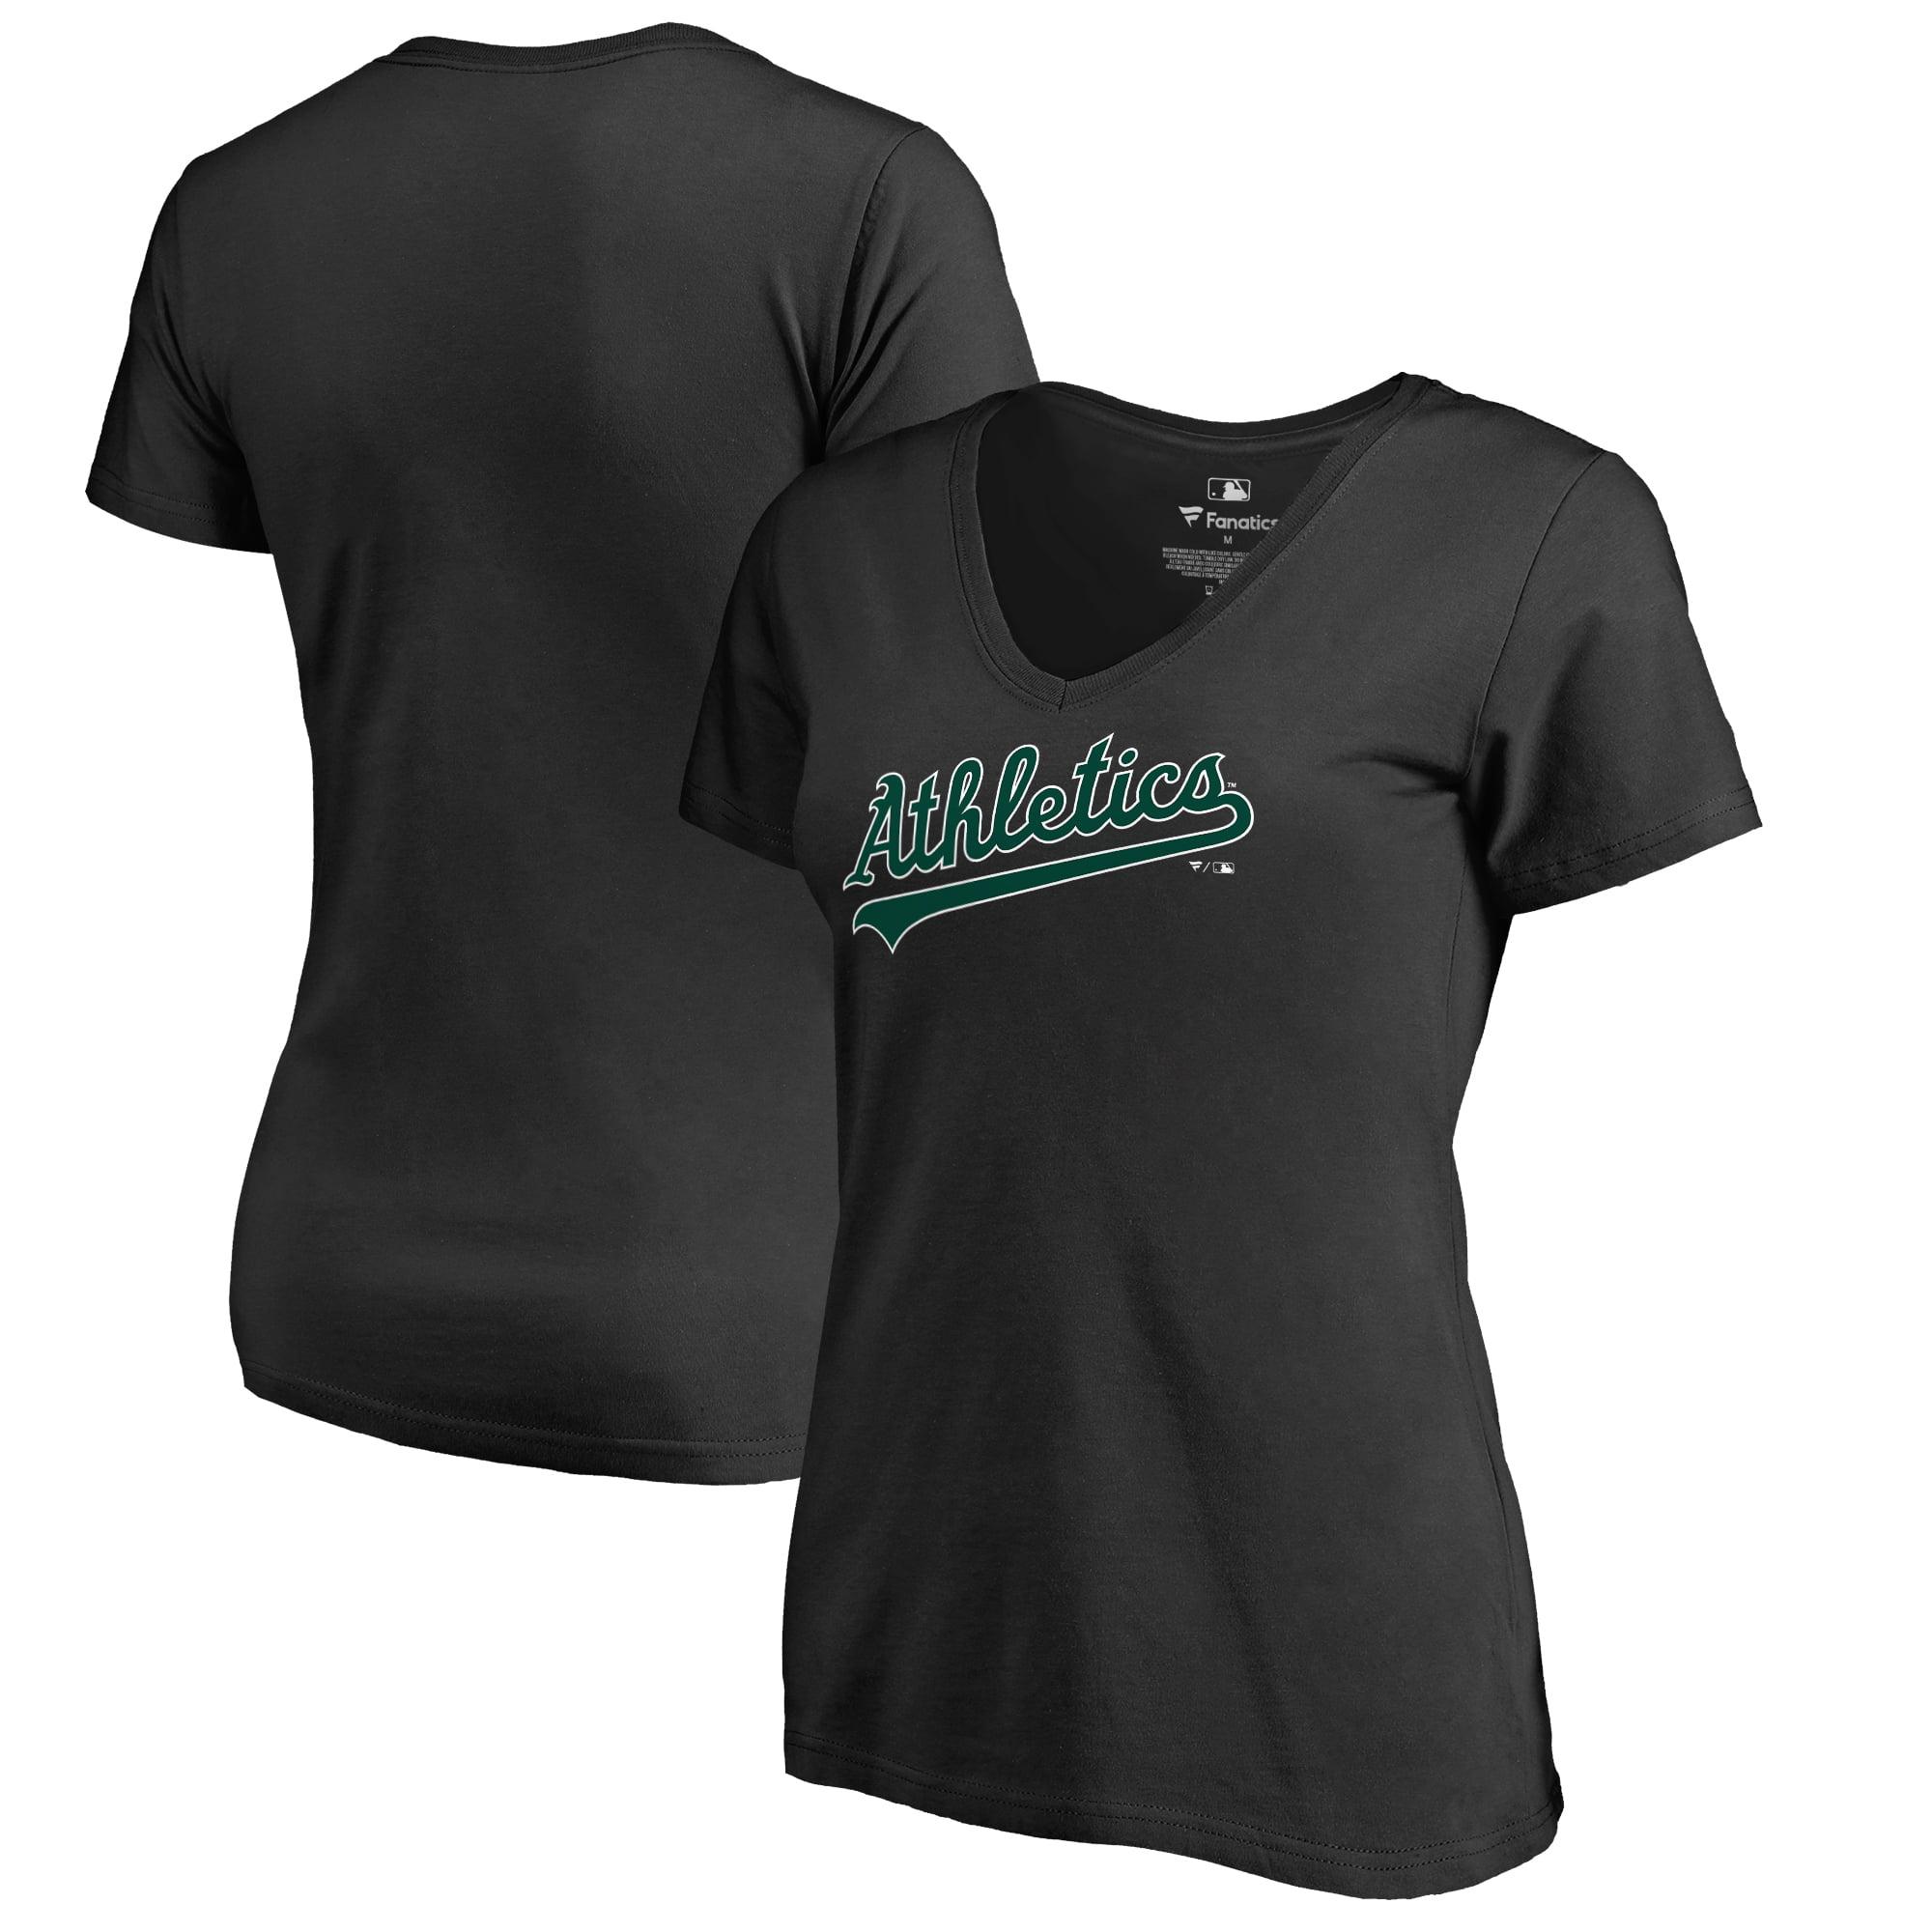 Oakland Athletics Fanatics Branded Women's Hometown Collection Turn Back The Clock V-Neck T-Shirt - Black